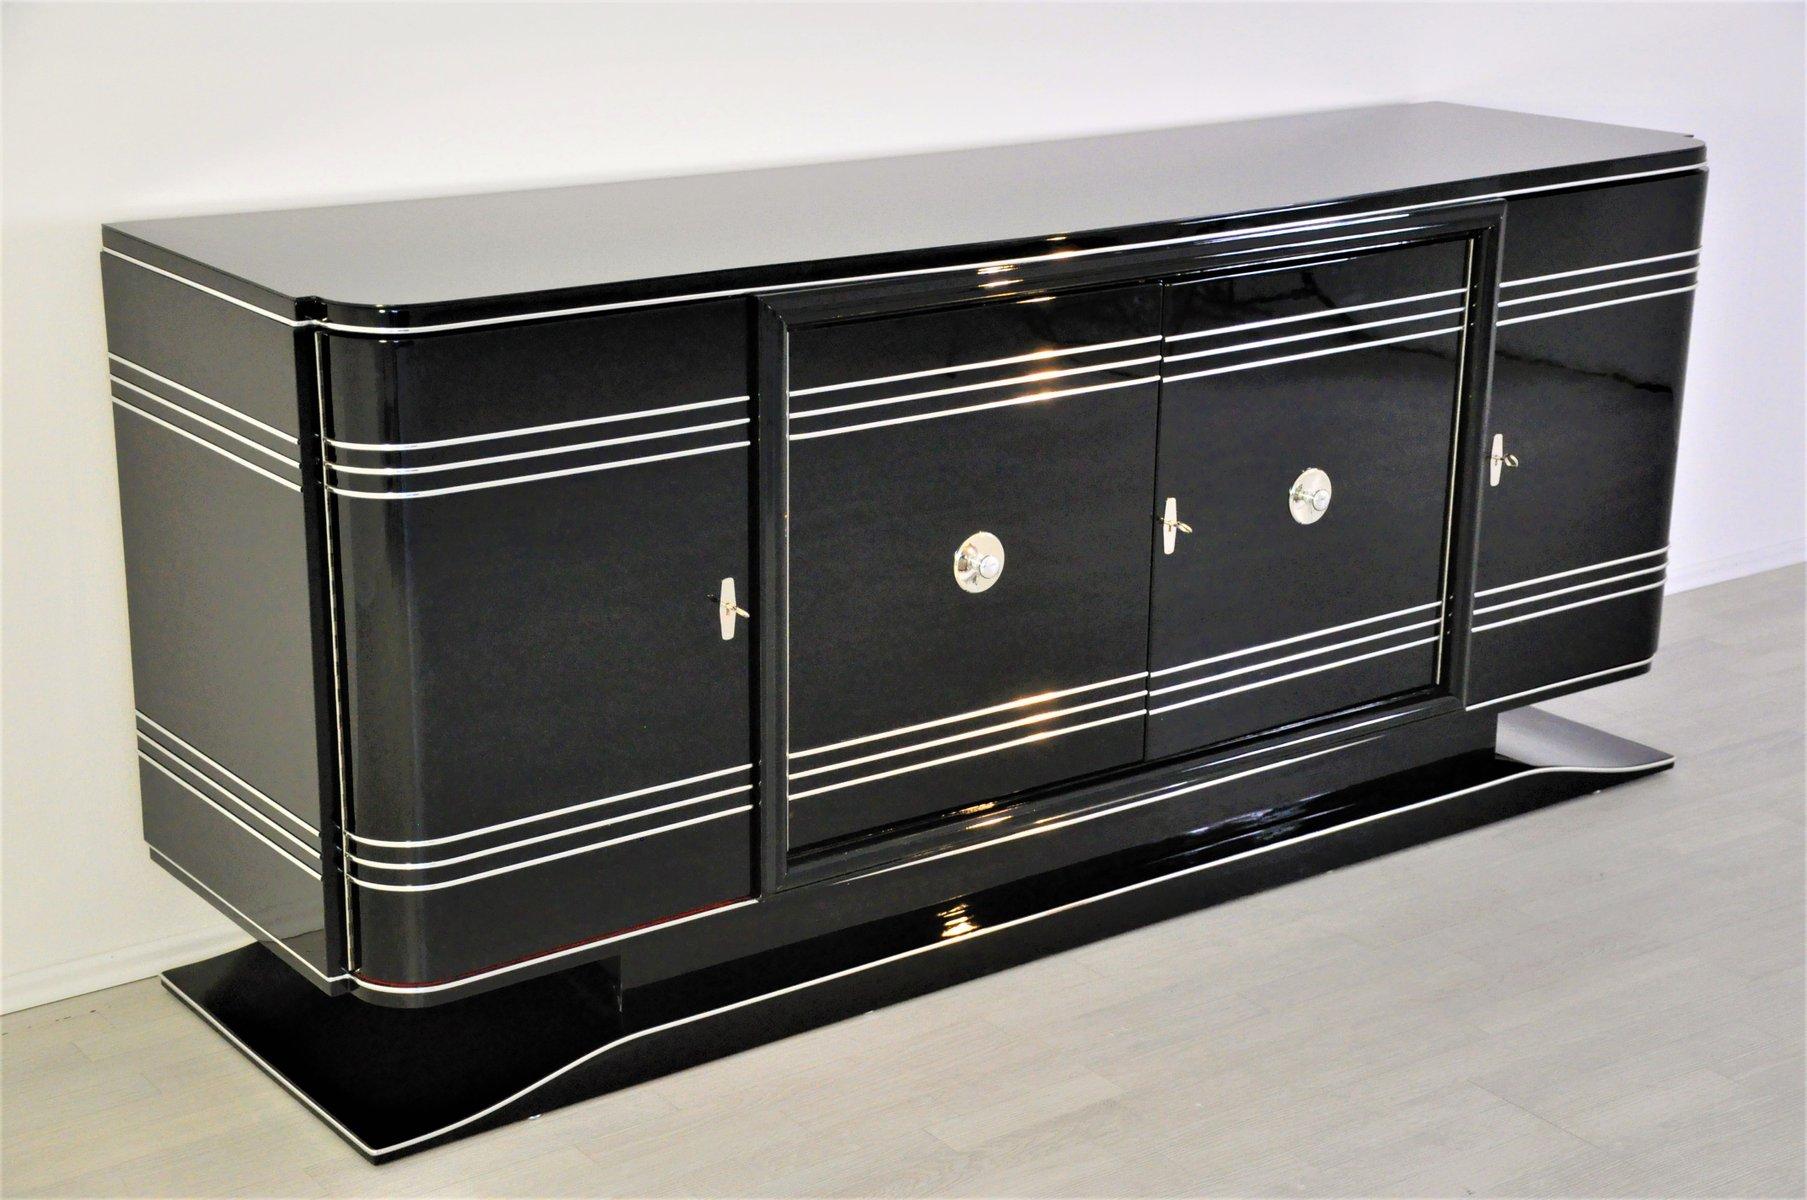 gro es art deco sideboard mit rotem barfach bei pamono kaufen. Black Bedroom Furniture Sets. Home Design Ideas